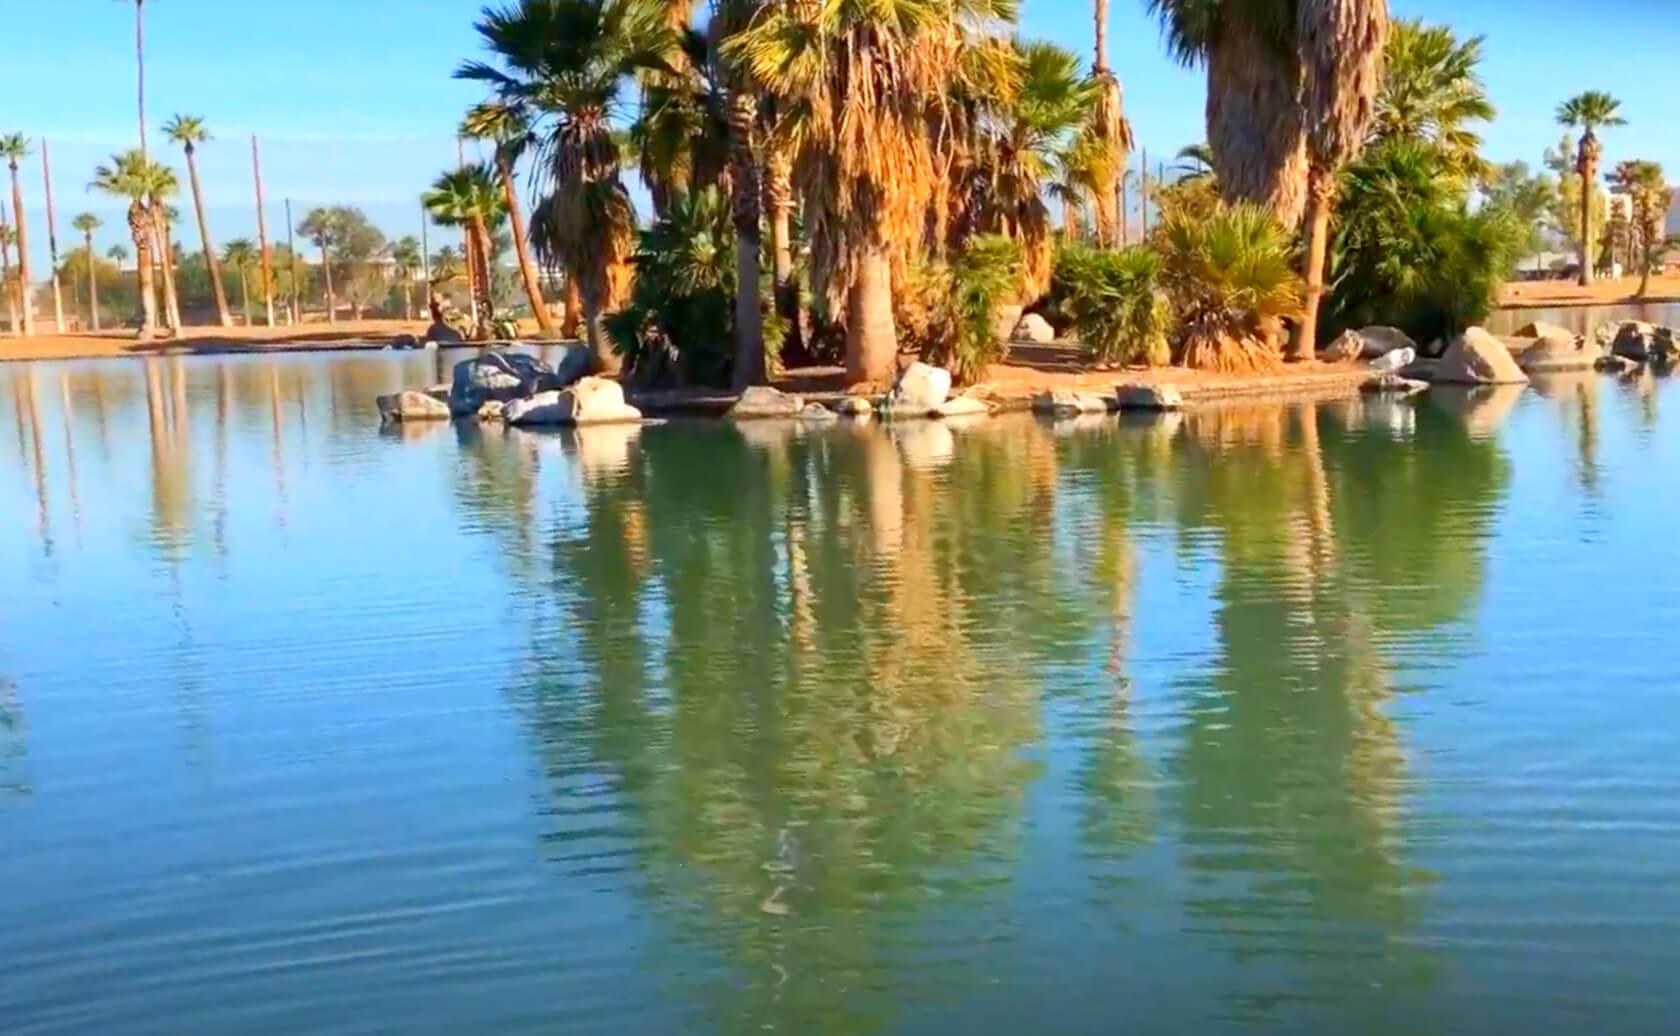 Encanto-Lake-fishing-guide-report-phoenix-az-04